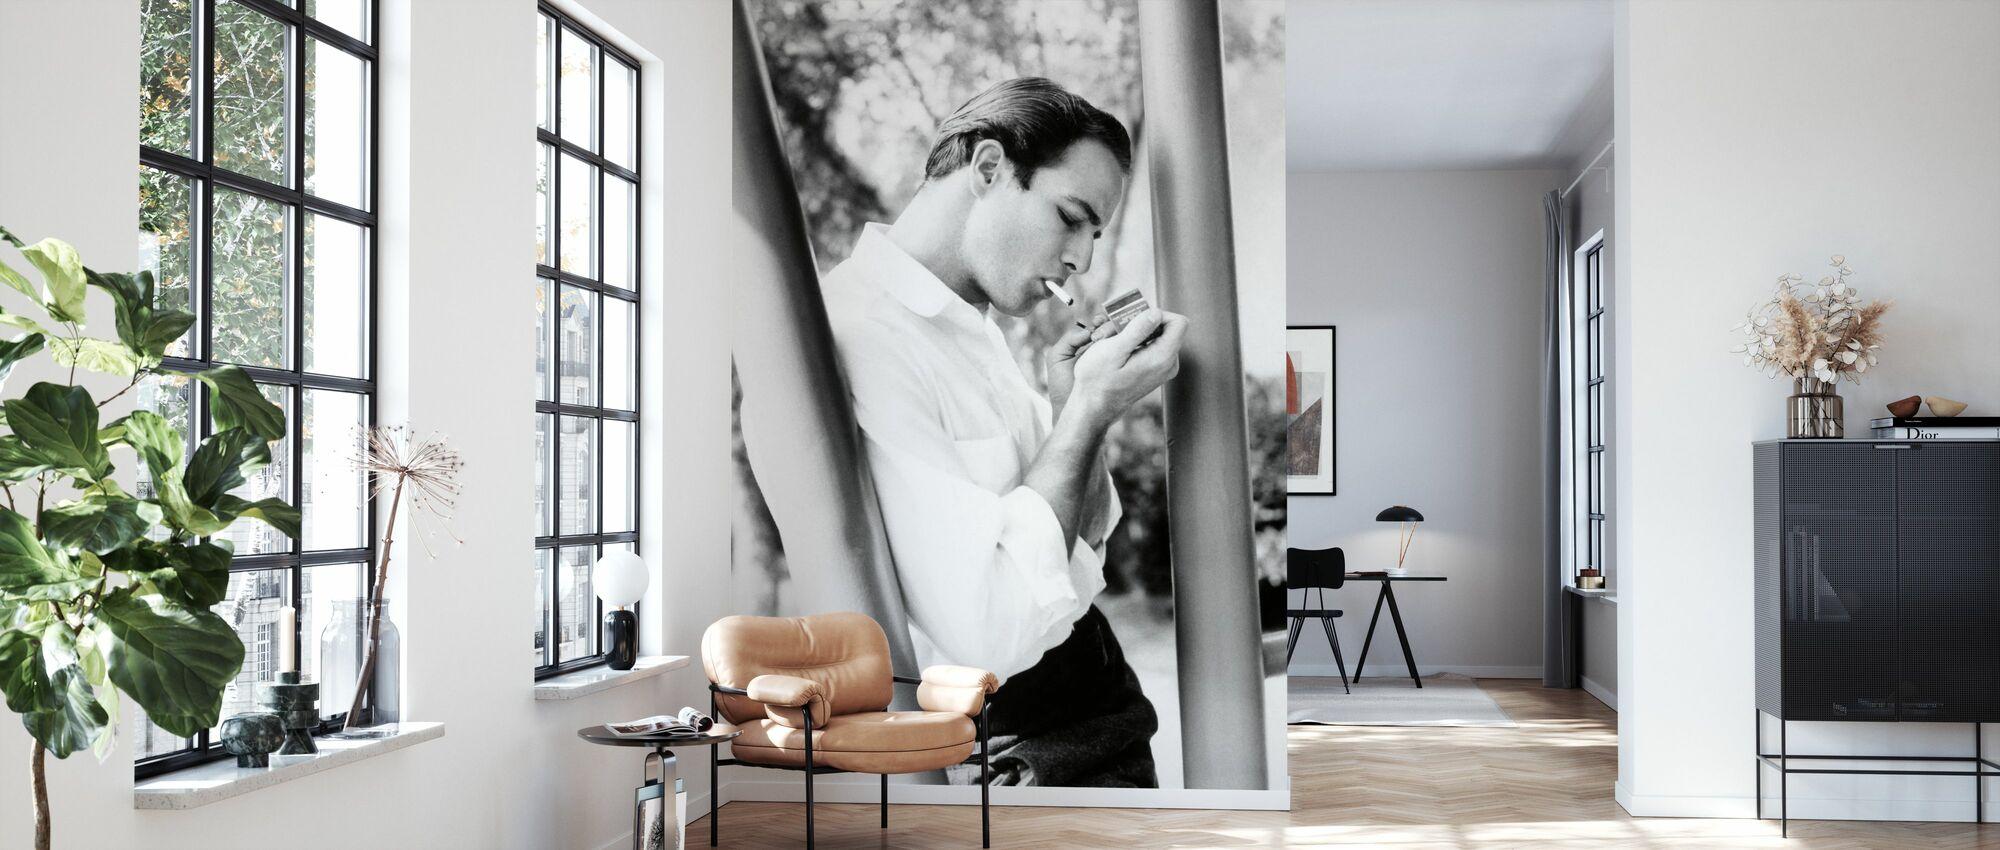 Marlon Brando - Tapet - Stue